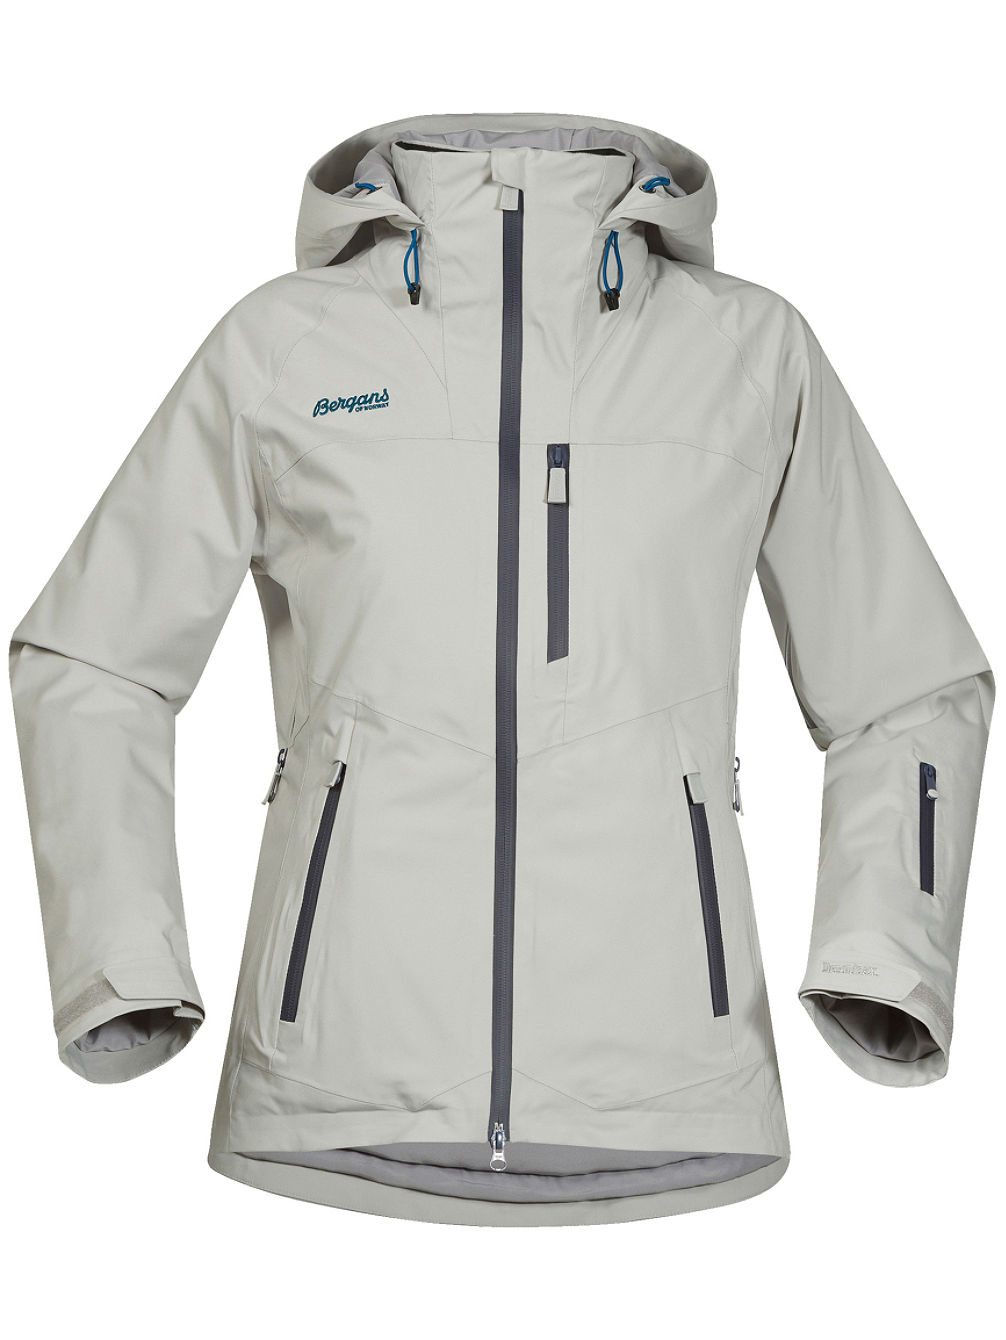 5bb5ae35 Buy Bergans Norefjell Jacket online at Blue Tomato